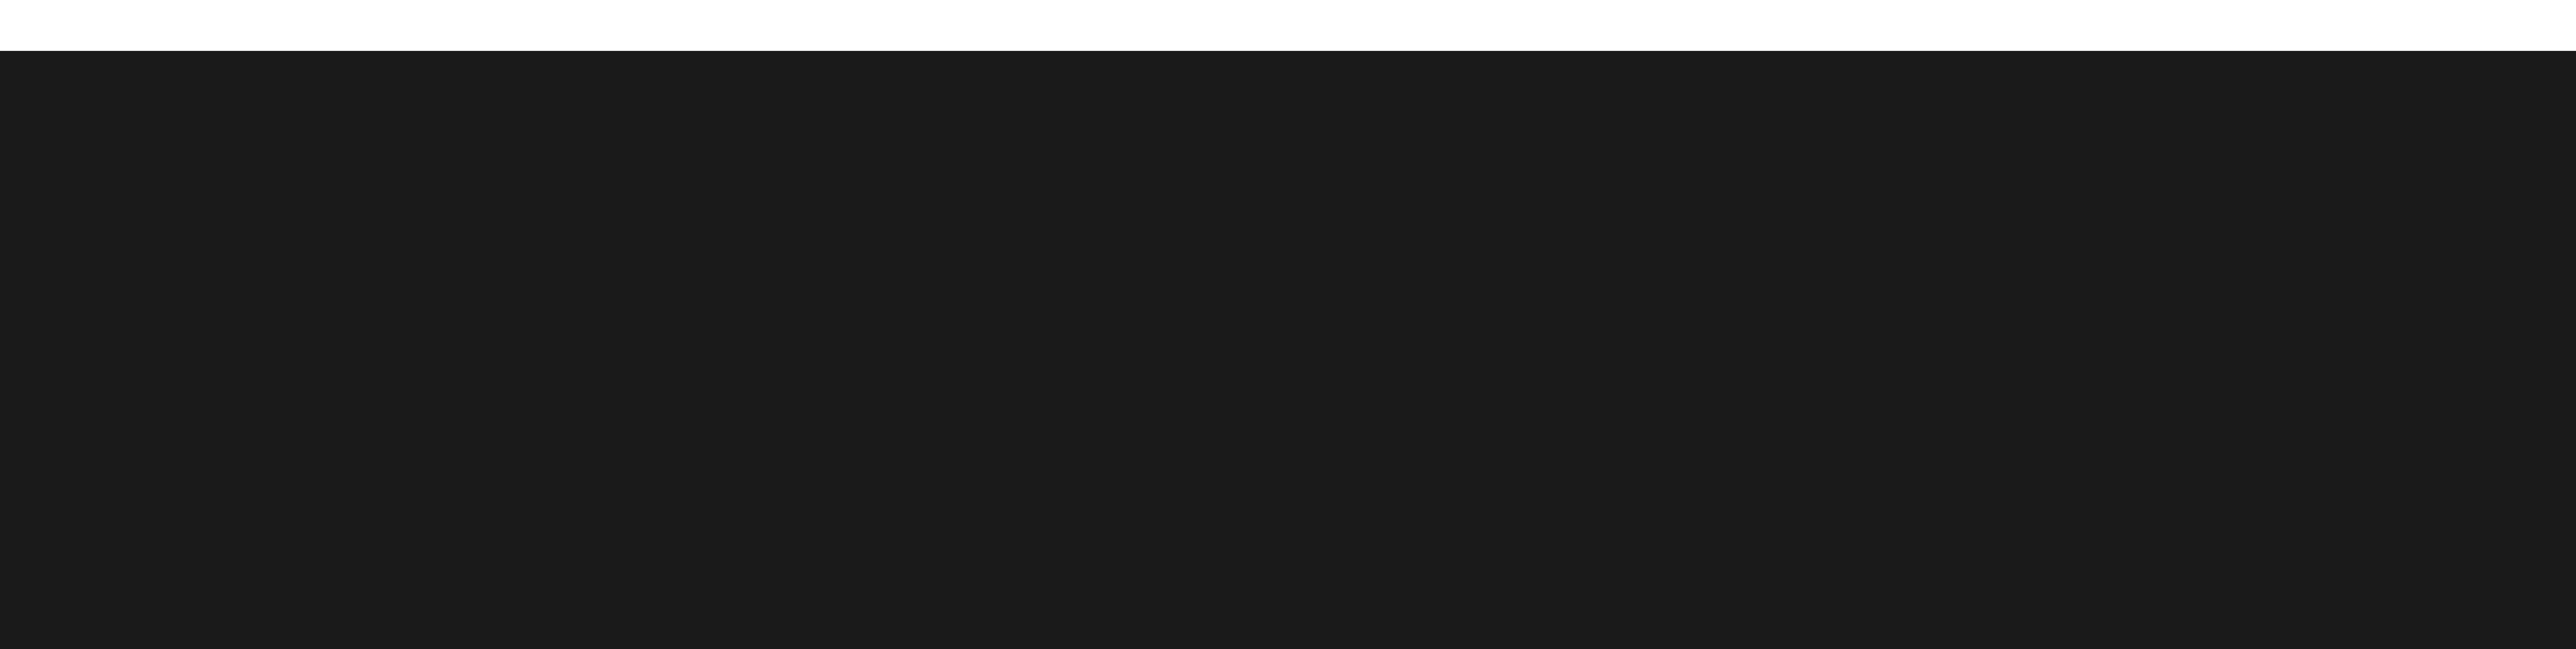 8000x2015 Skyscraper Vector Simple Huge Freebie! Download For Powerpoint